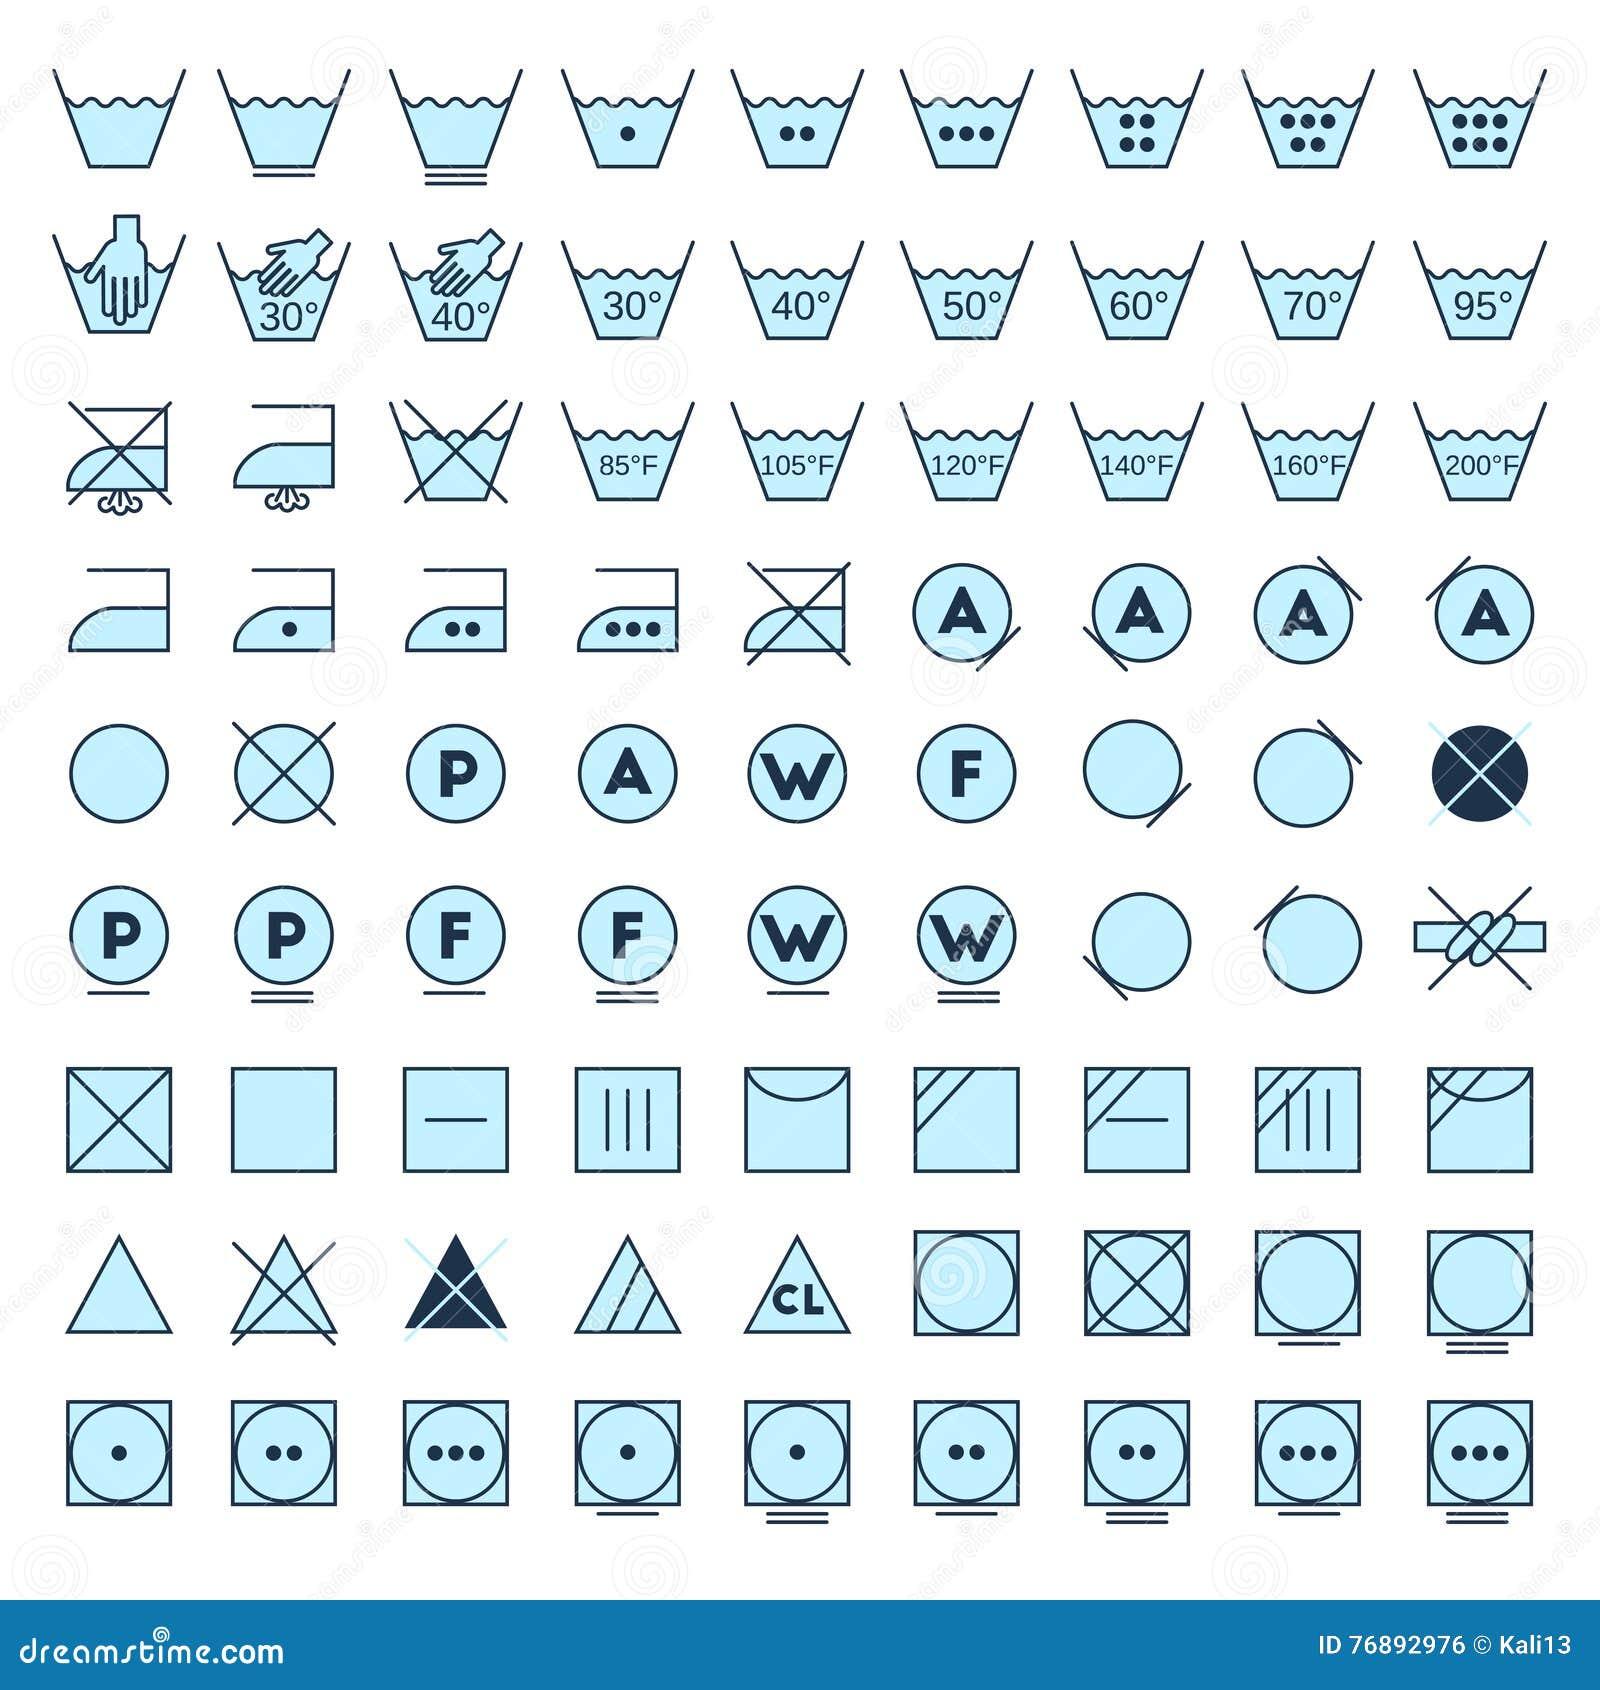 Laundry Symbols Line Design Stock Vector Illustration Of Iron